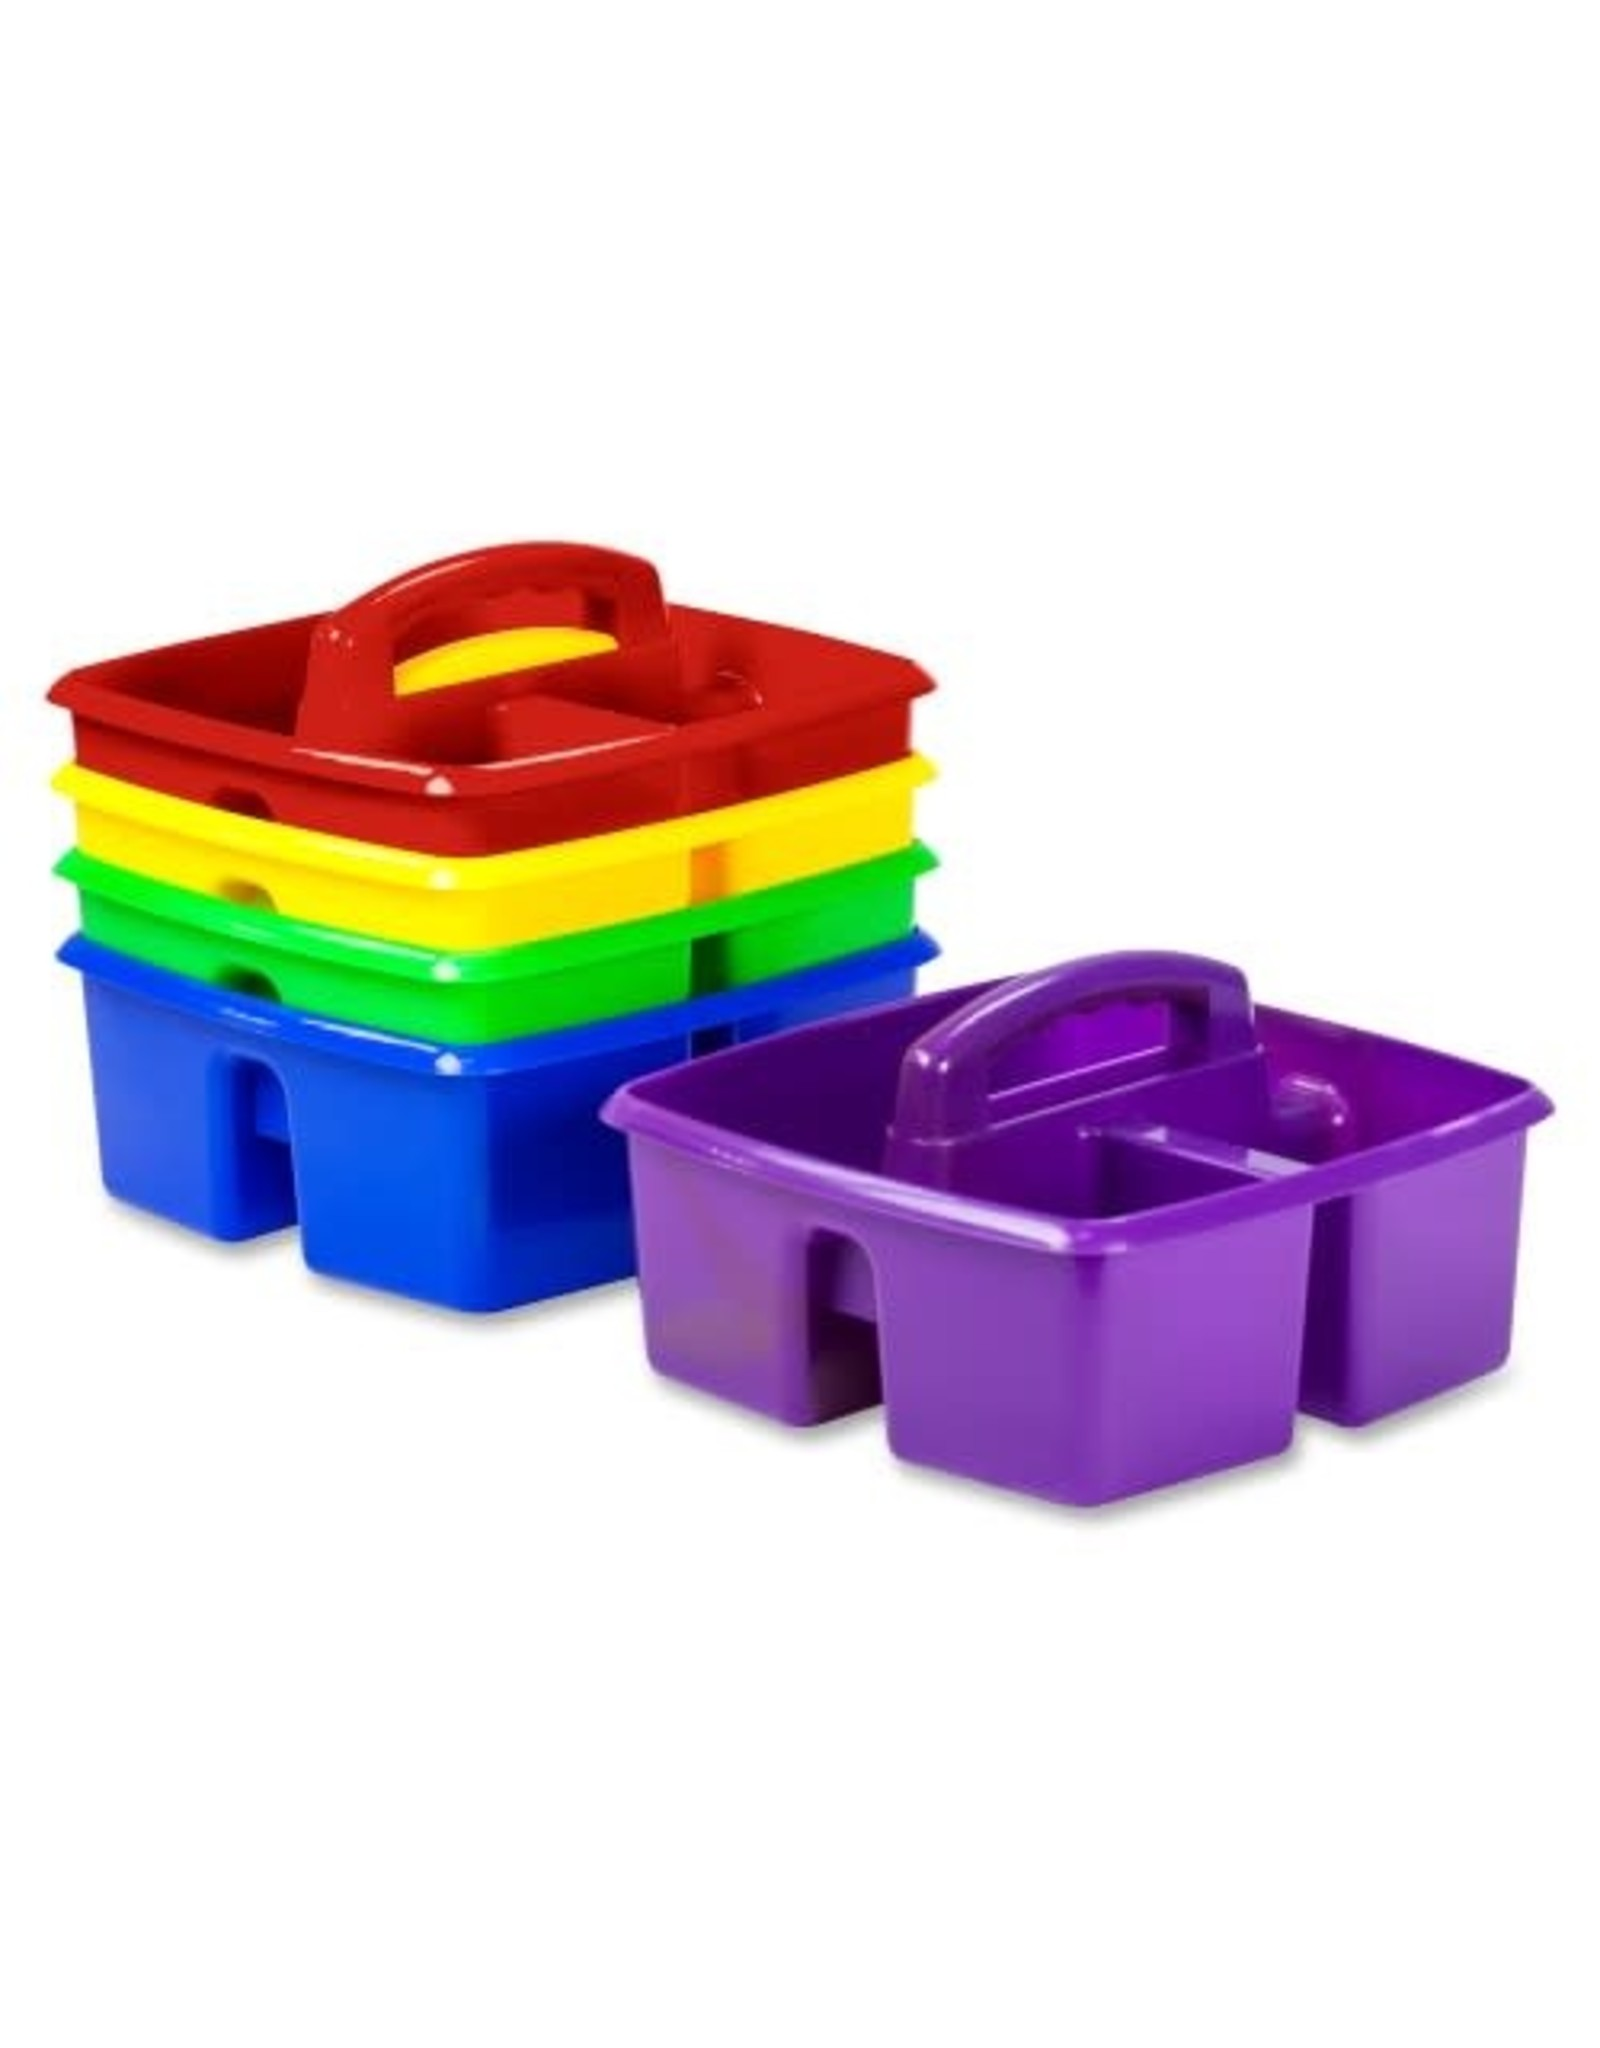 Storex CADDY-SMALL, CLASSROOM CADDY, 5 ASSORTED/SET